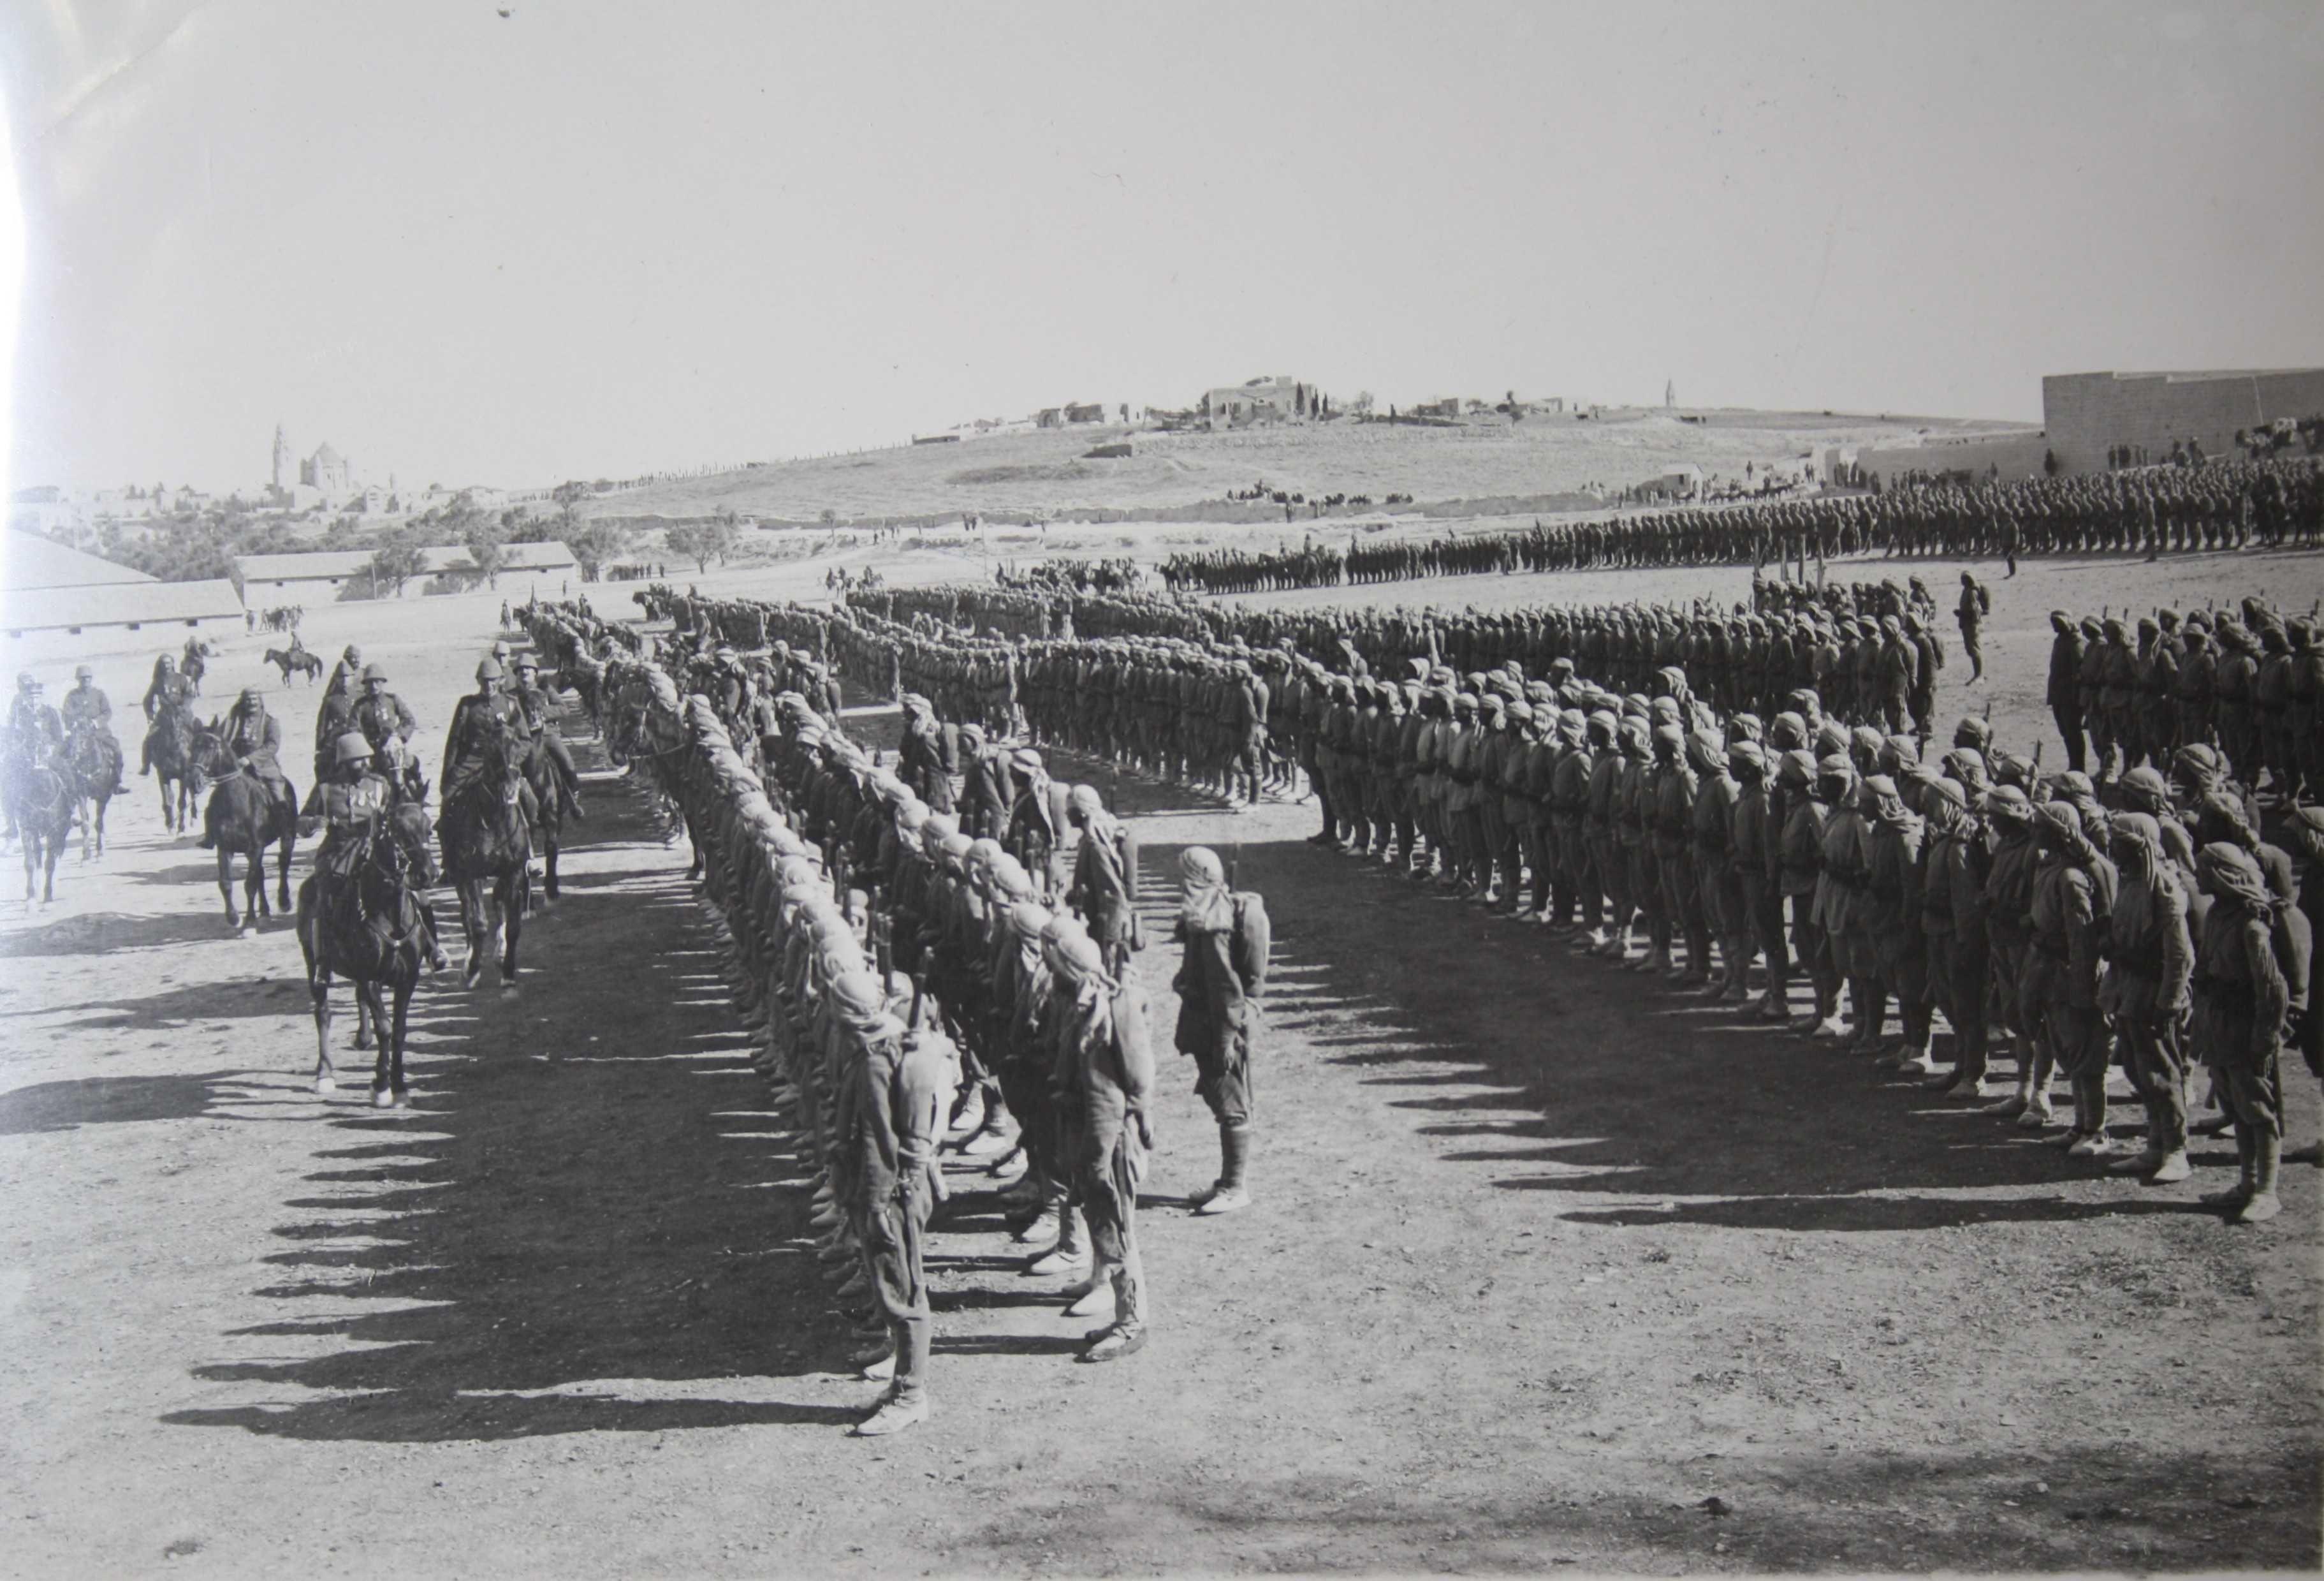 Ottoman_soldiers_WWI.jpg (3645×2479) | Armies | Pinterest | Army